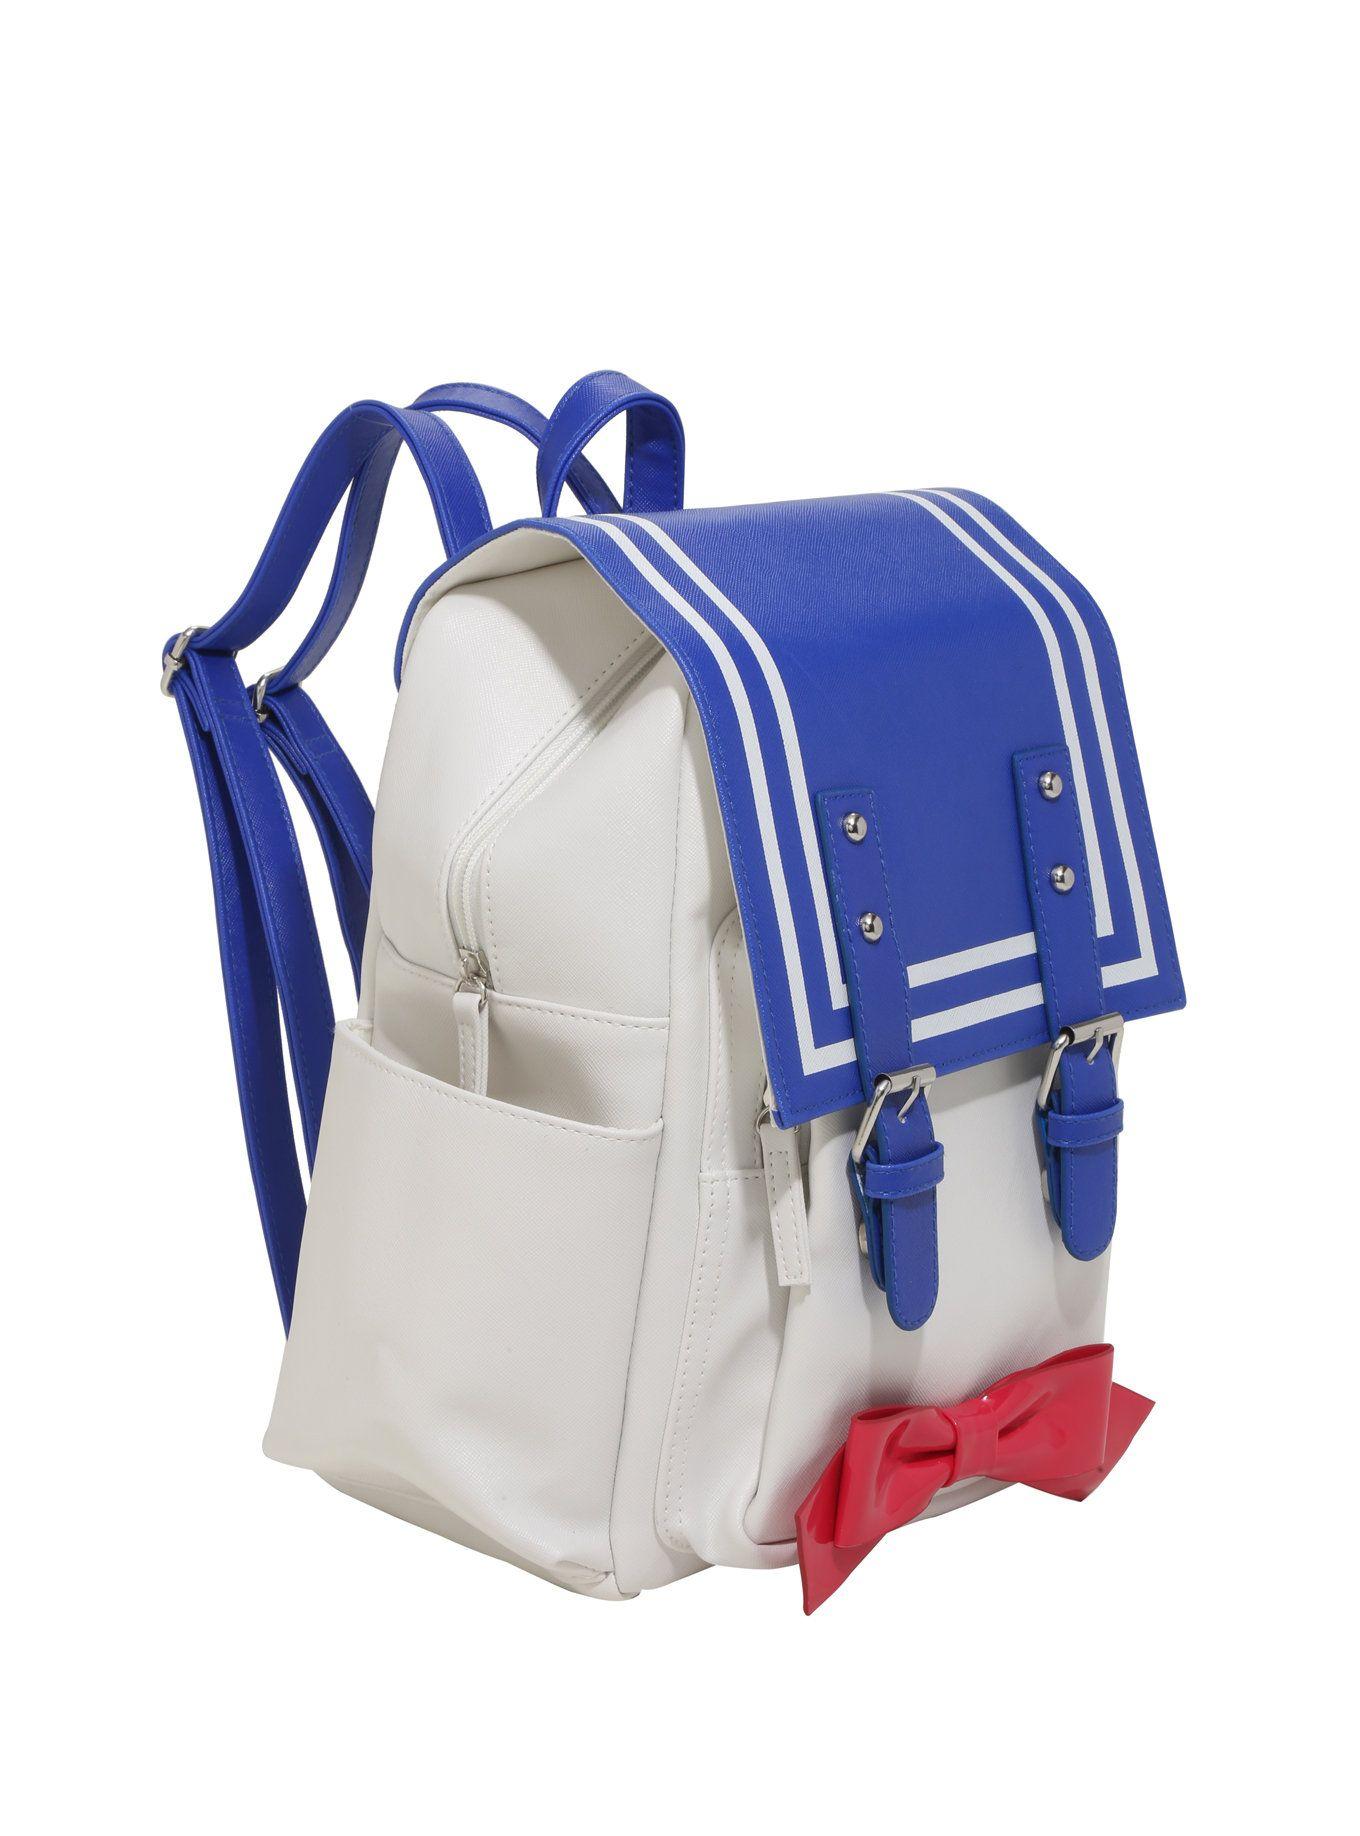 49f8518219 Sailor Moon Suit Mini Backpack